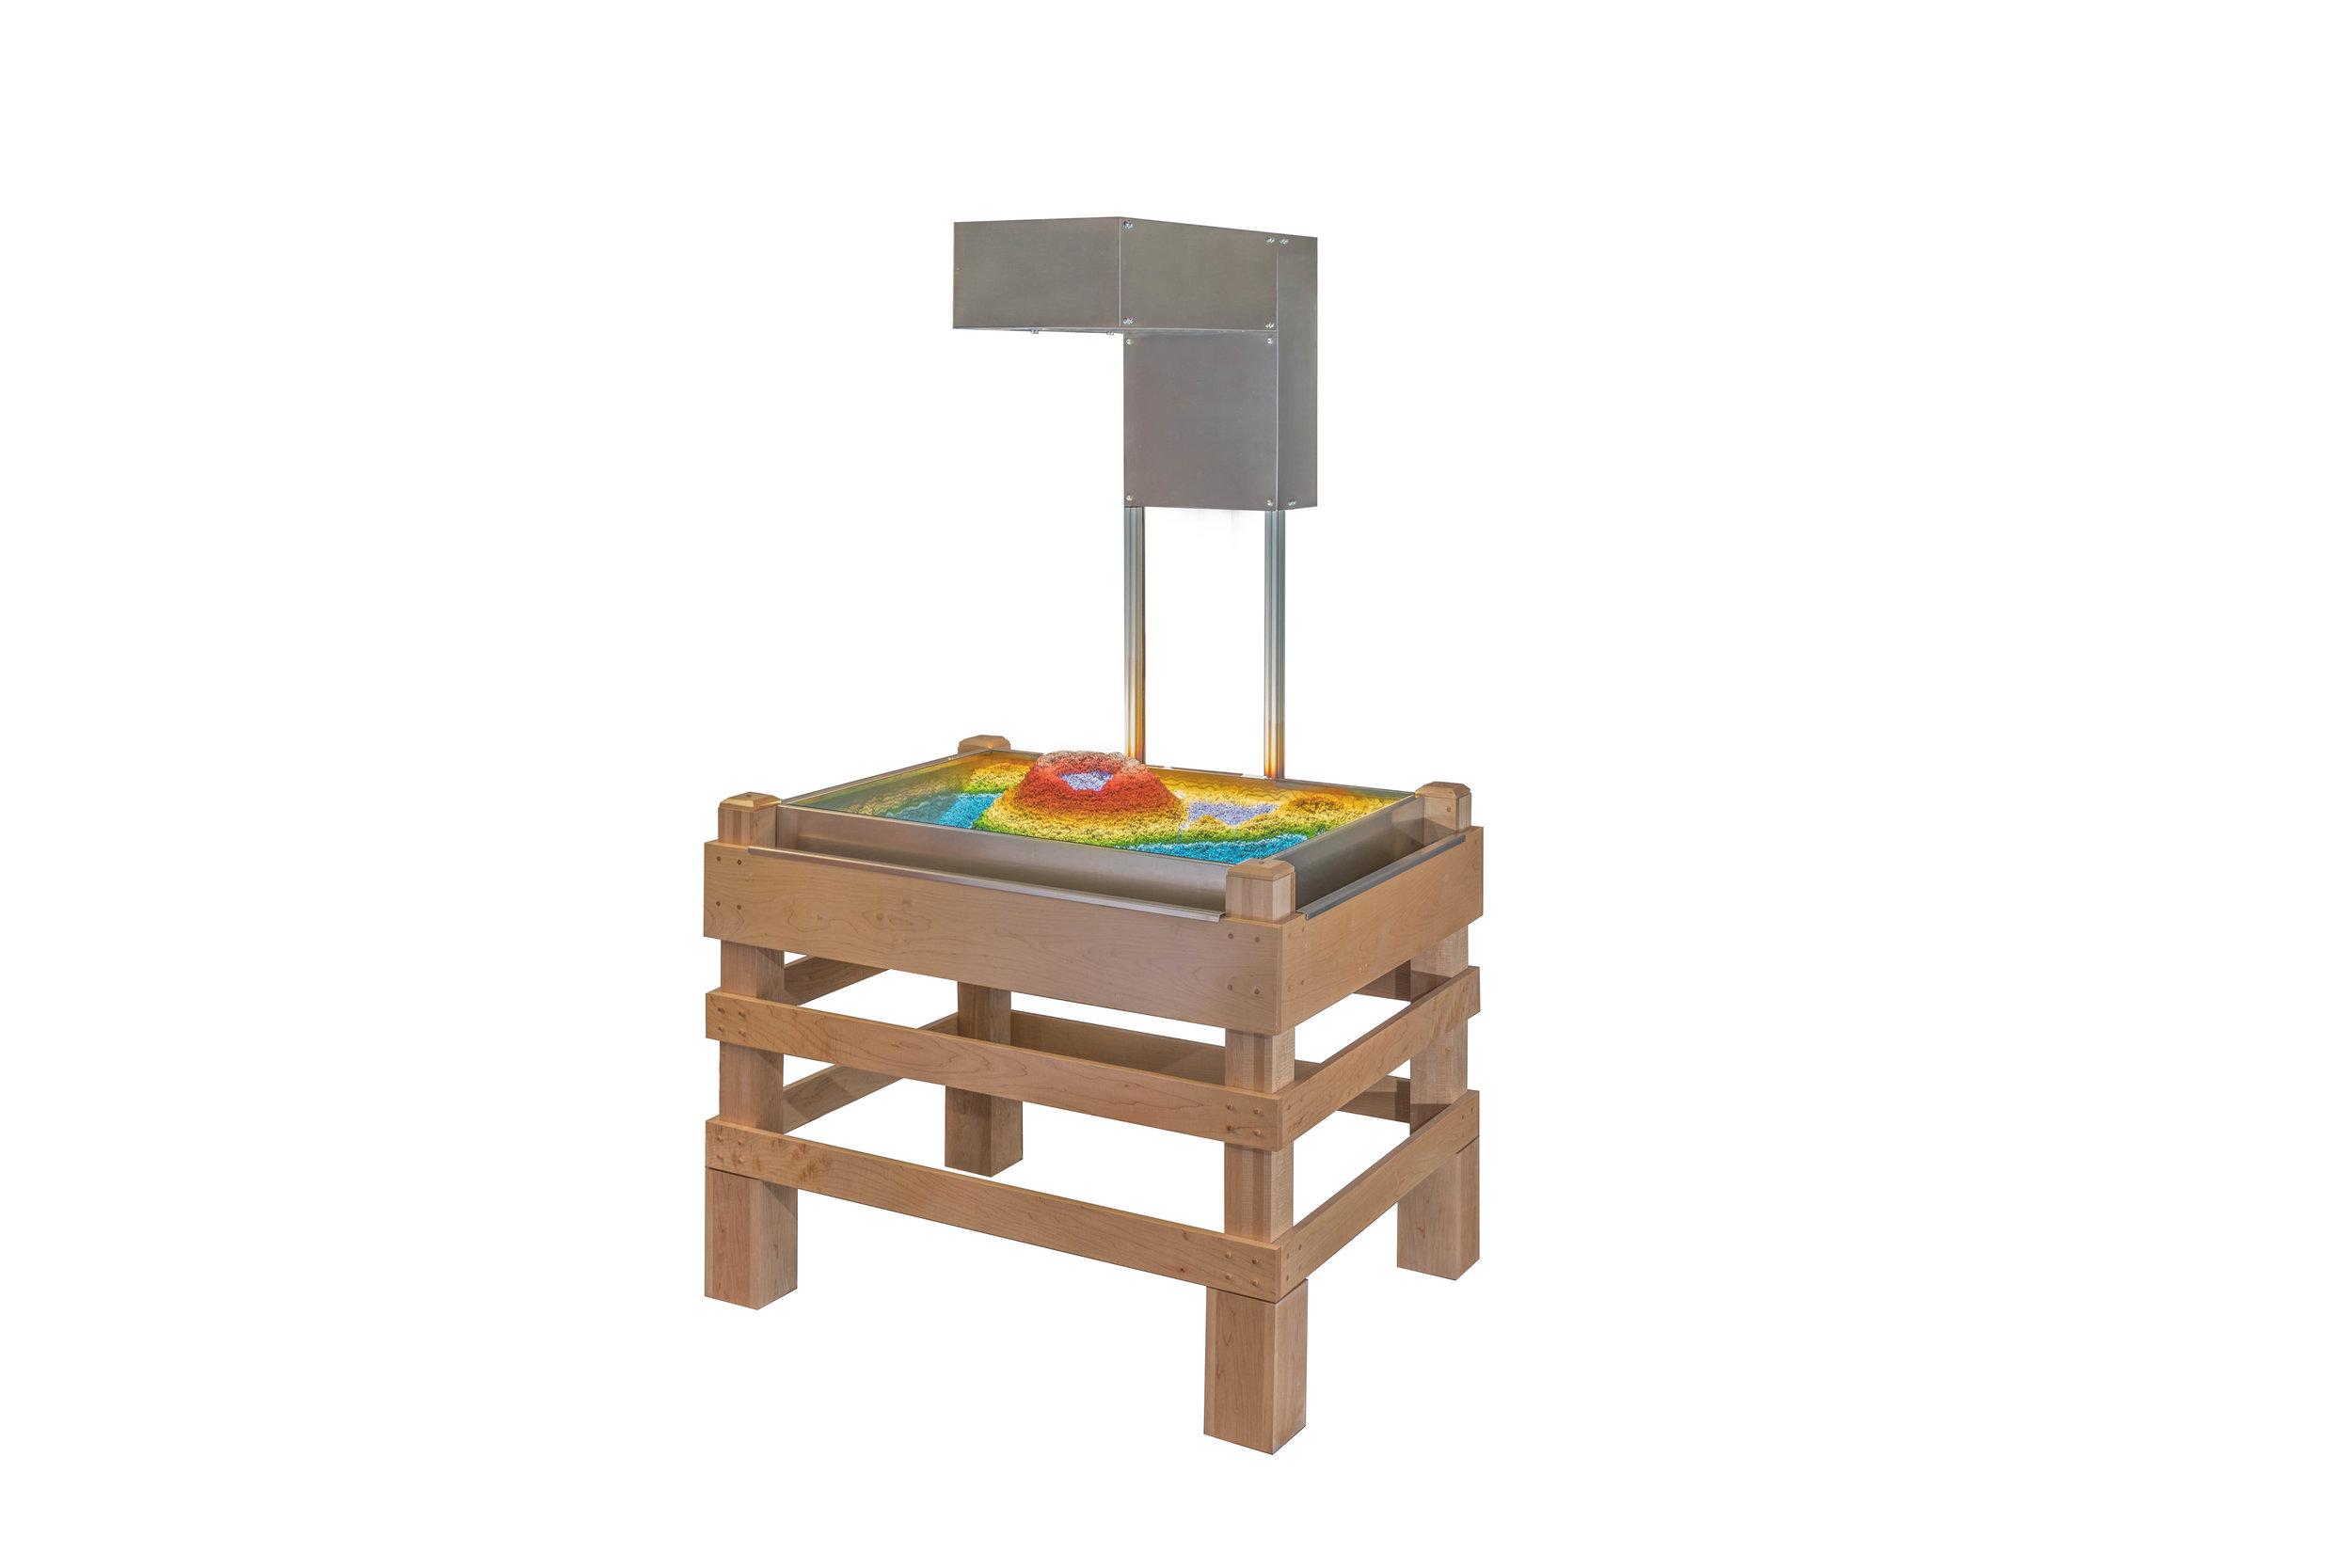 Museum Model - $16,900